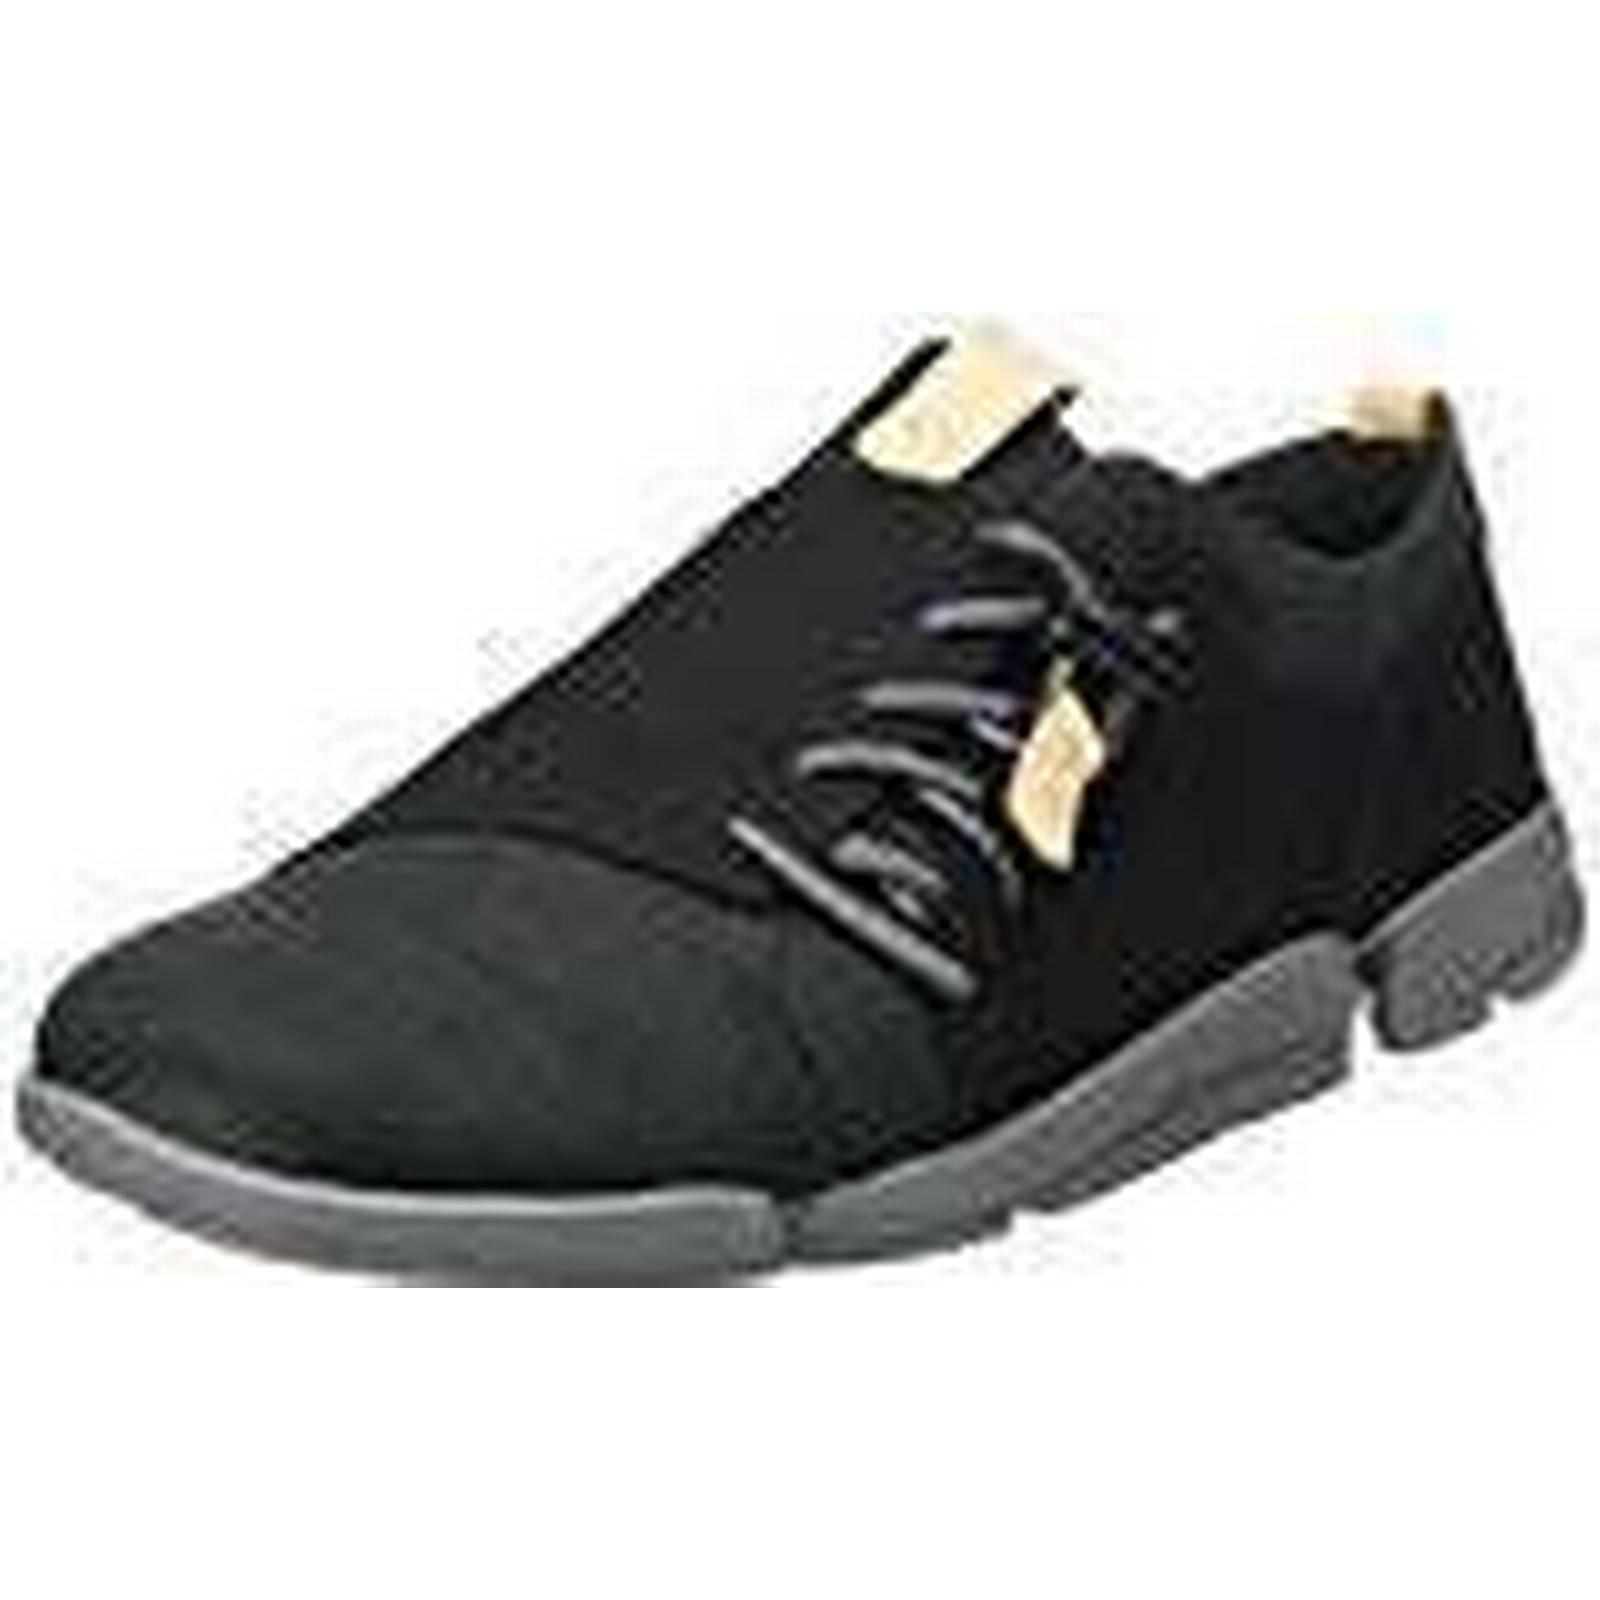 Clarks Women''s Tri Camilla Low-Top UK Sneakers, (Black Nubuck), 4.5 UK Low-Top d8ded7